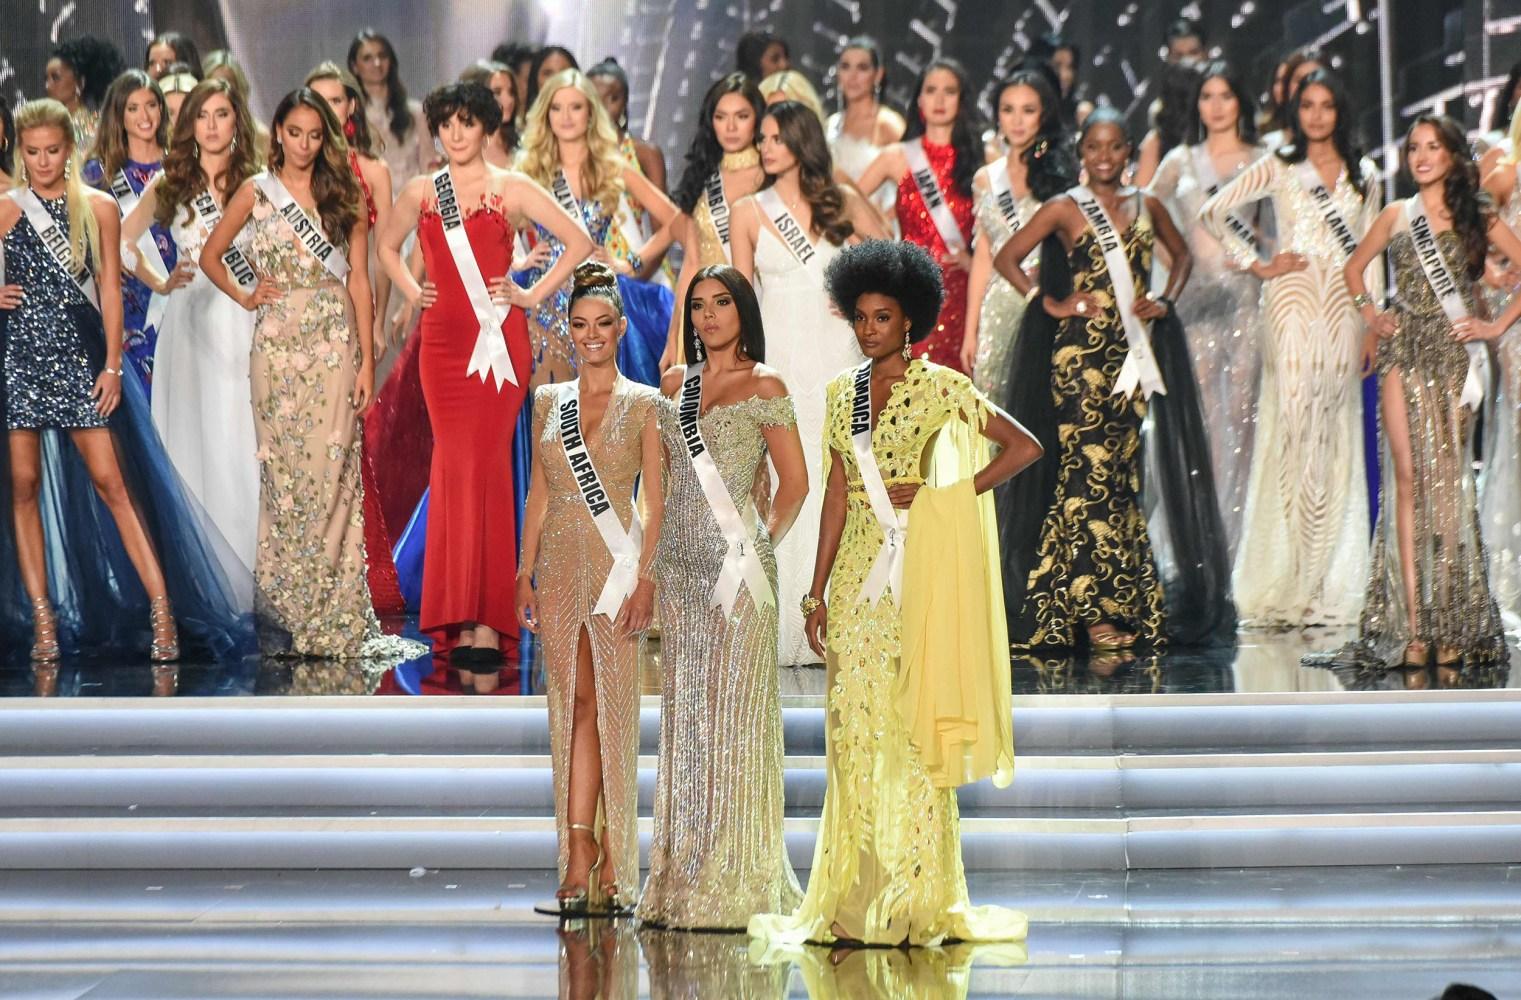 Image Miss Universe 2017